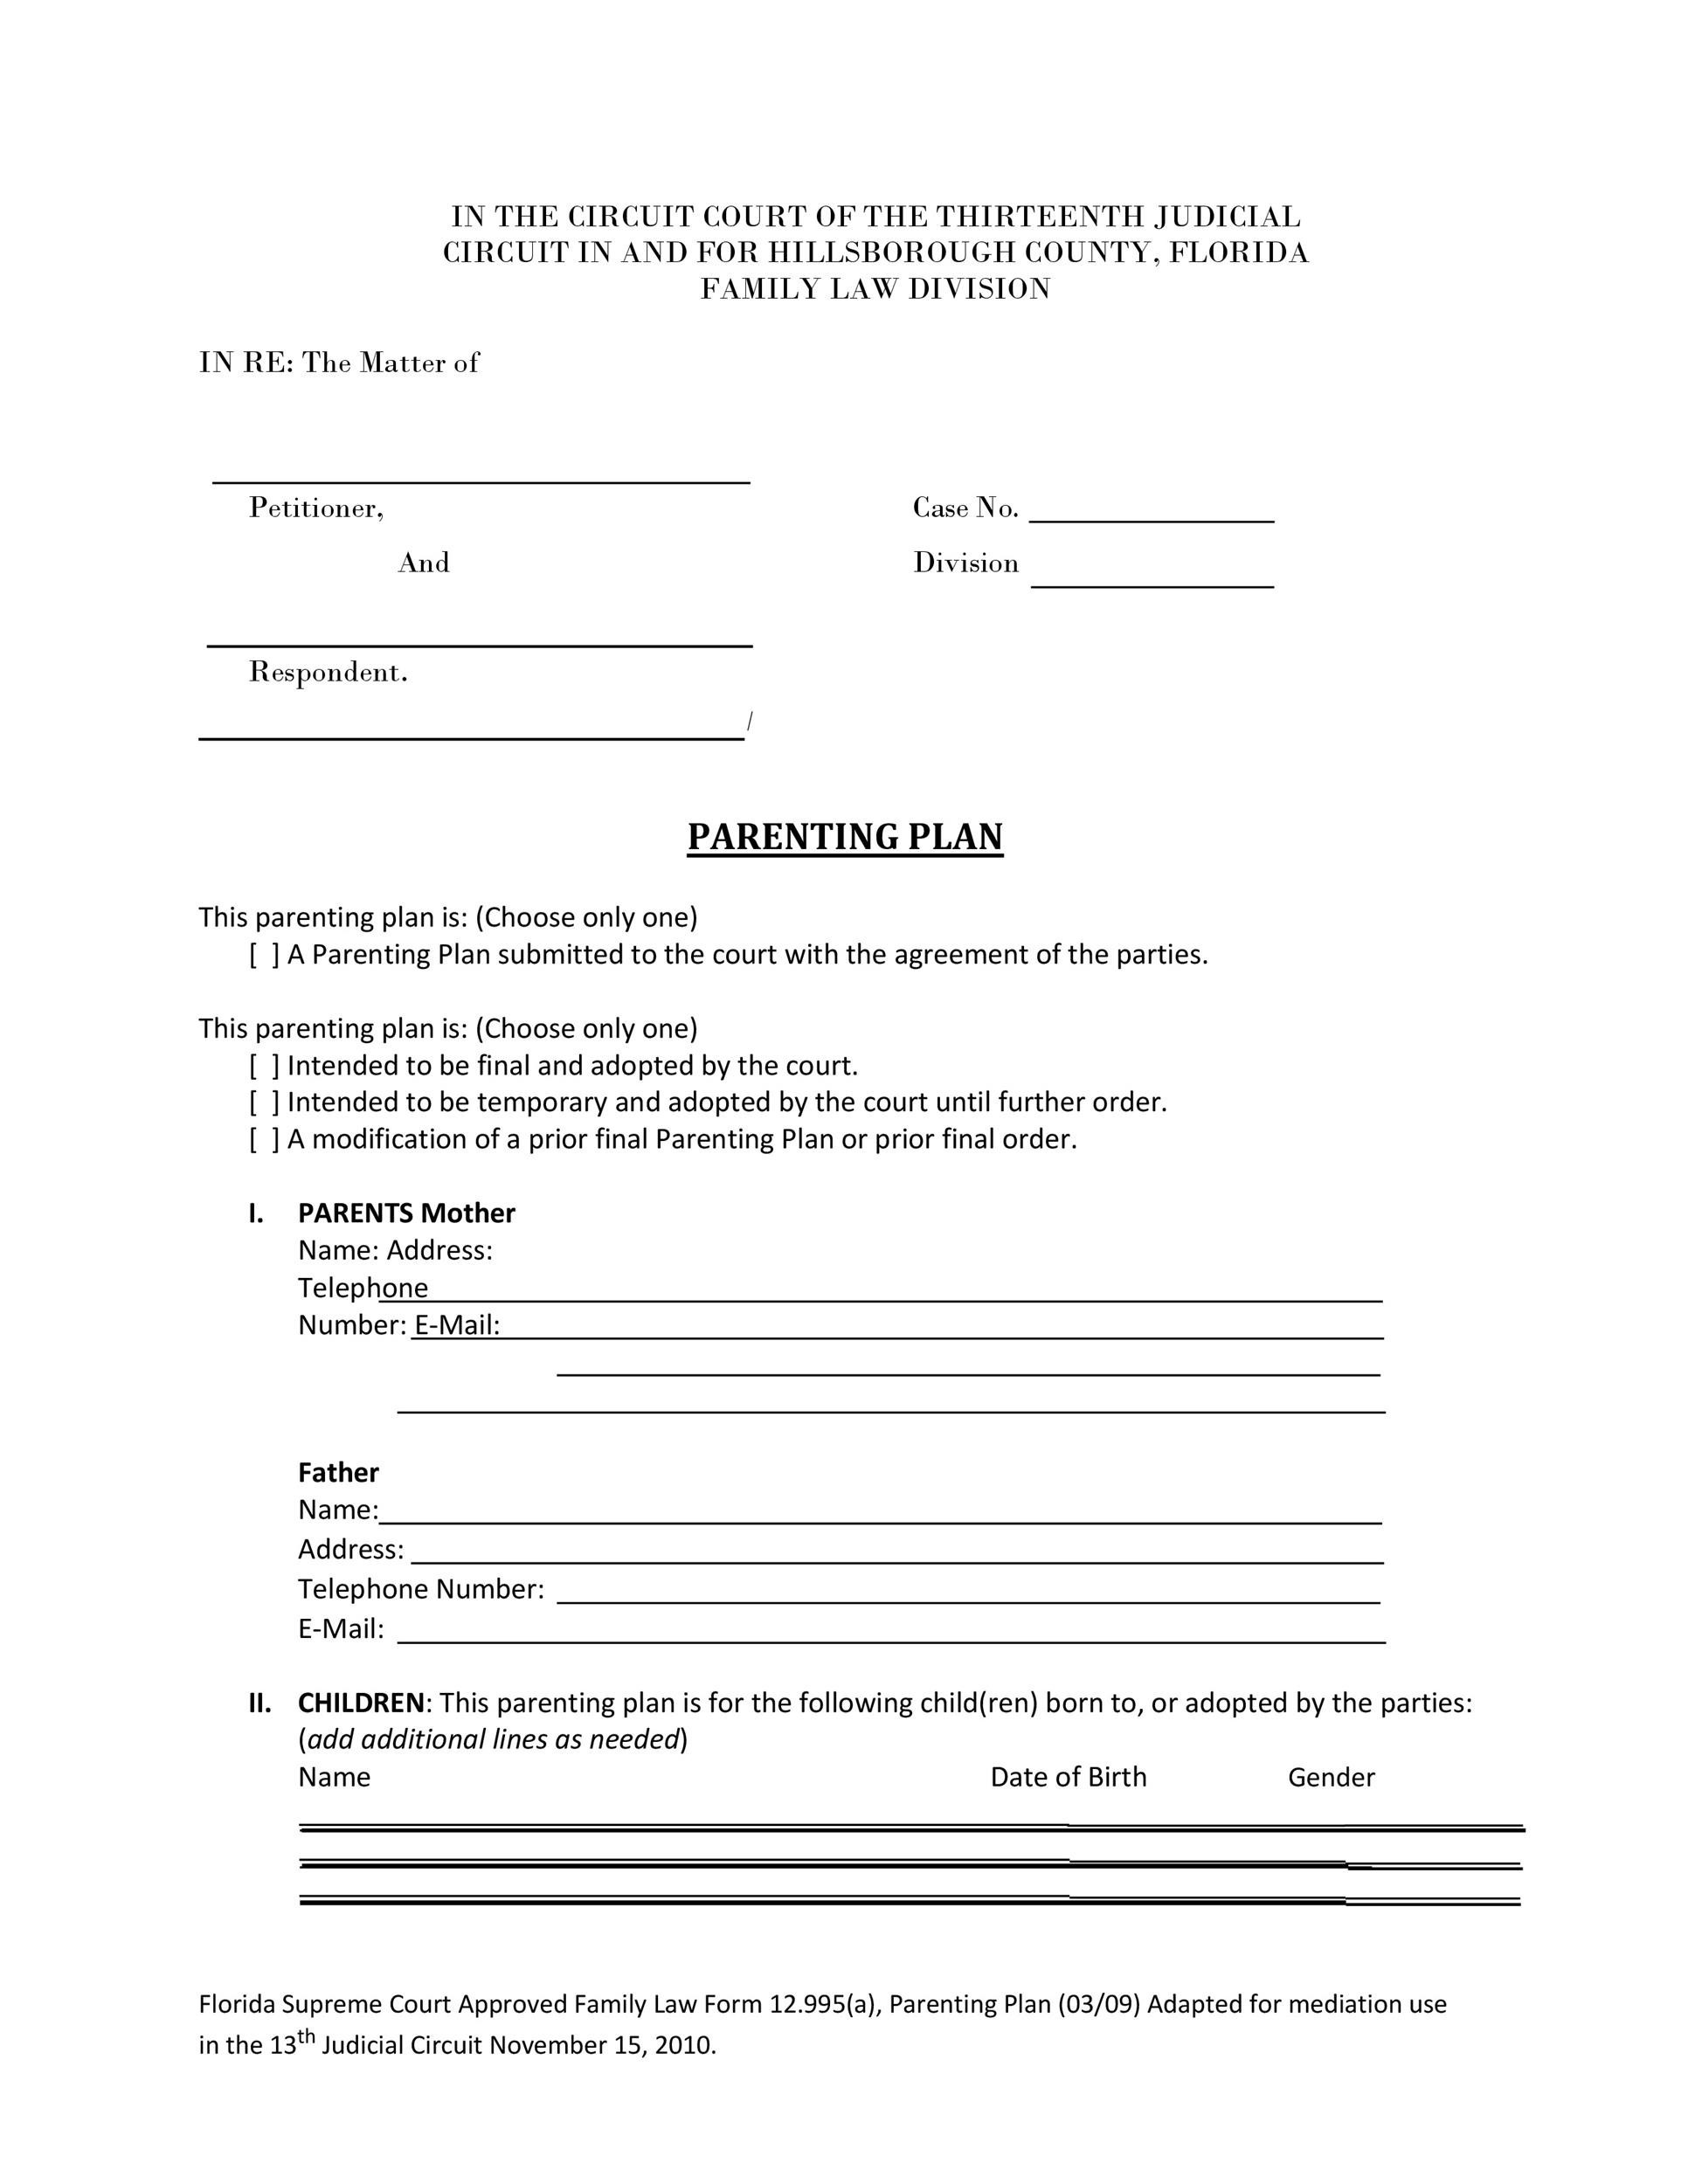 Free parenting plan template 31